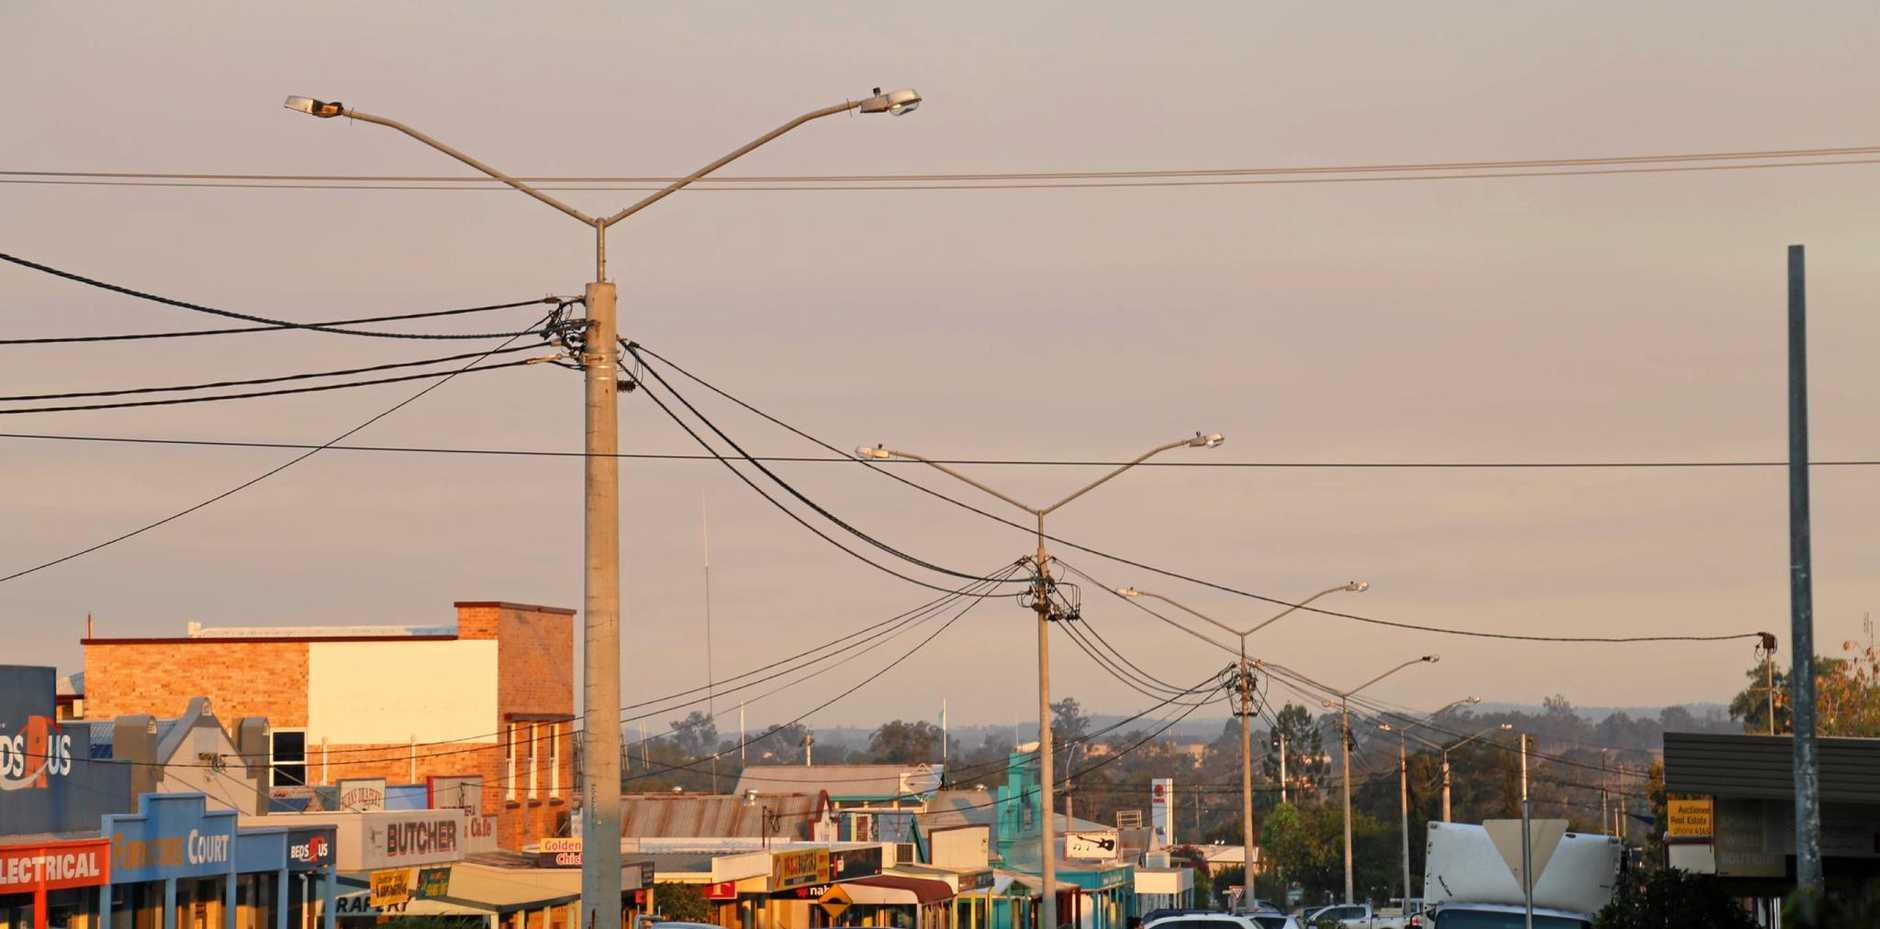 Smoke from the Bushfire at Derri Derra covering the main street of Mundubbera at sunset.